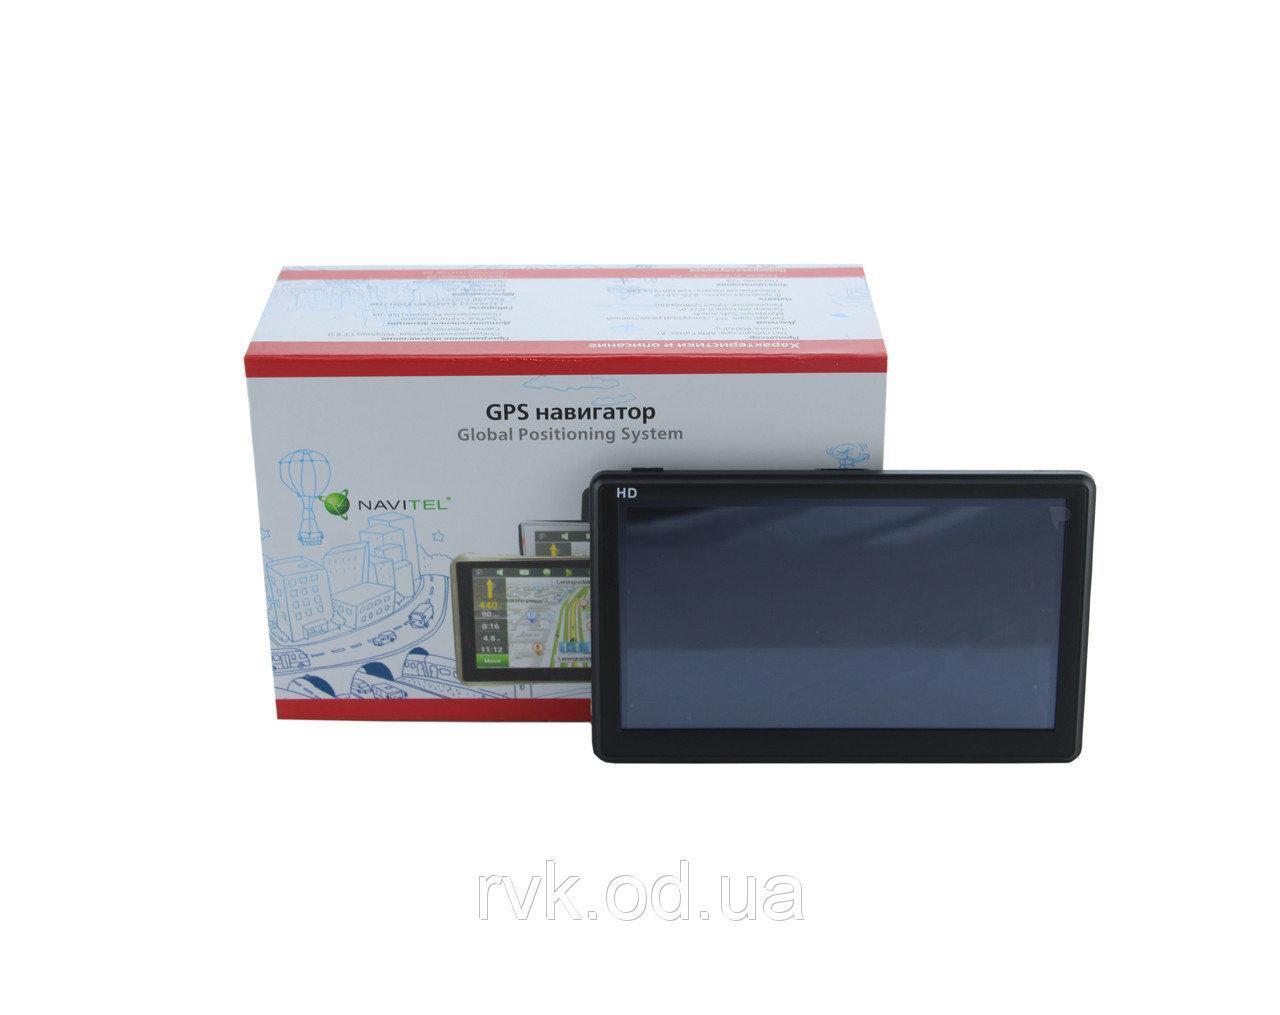 "Навигатор GPS 8004 7"" ddr2-128mb 8gb HD\ емкостный экран"